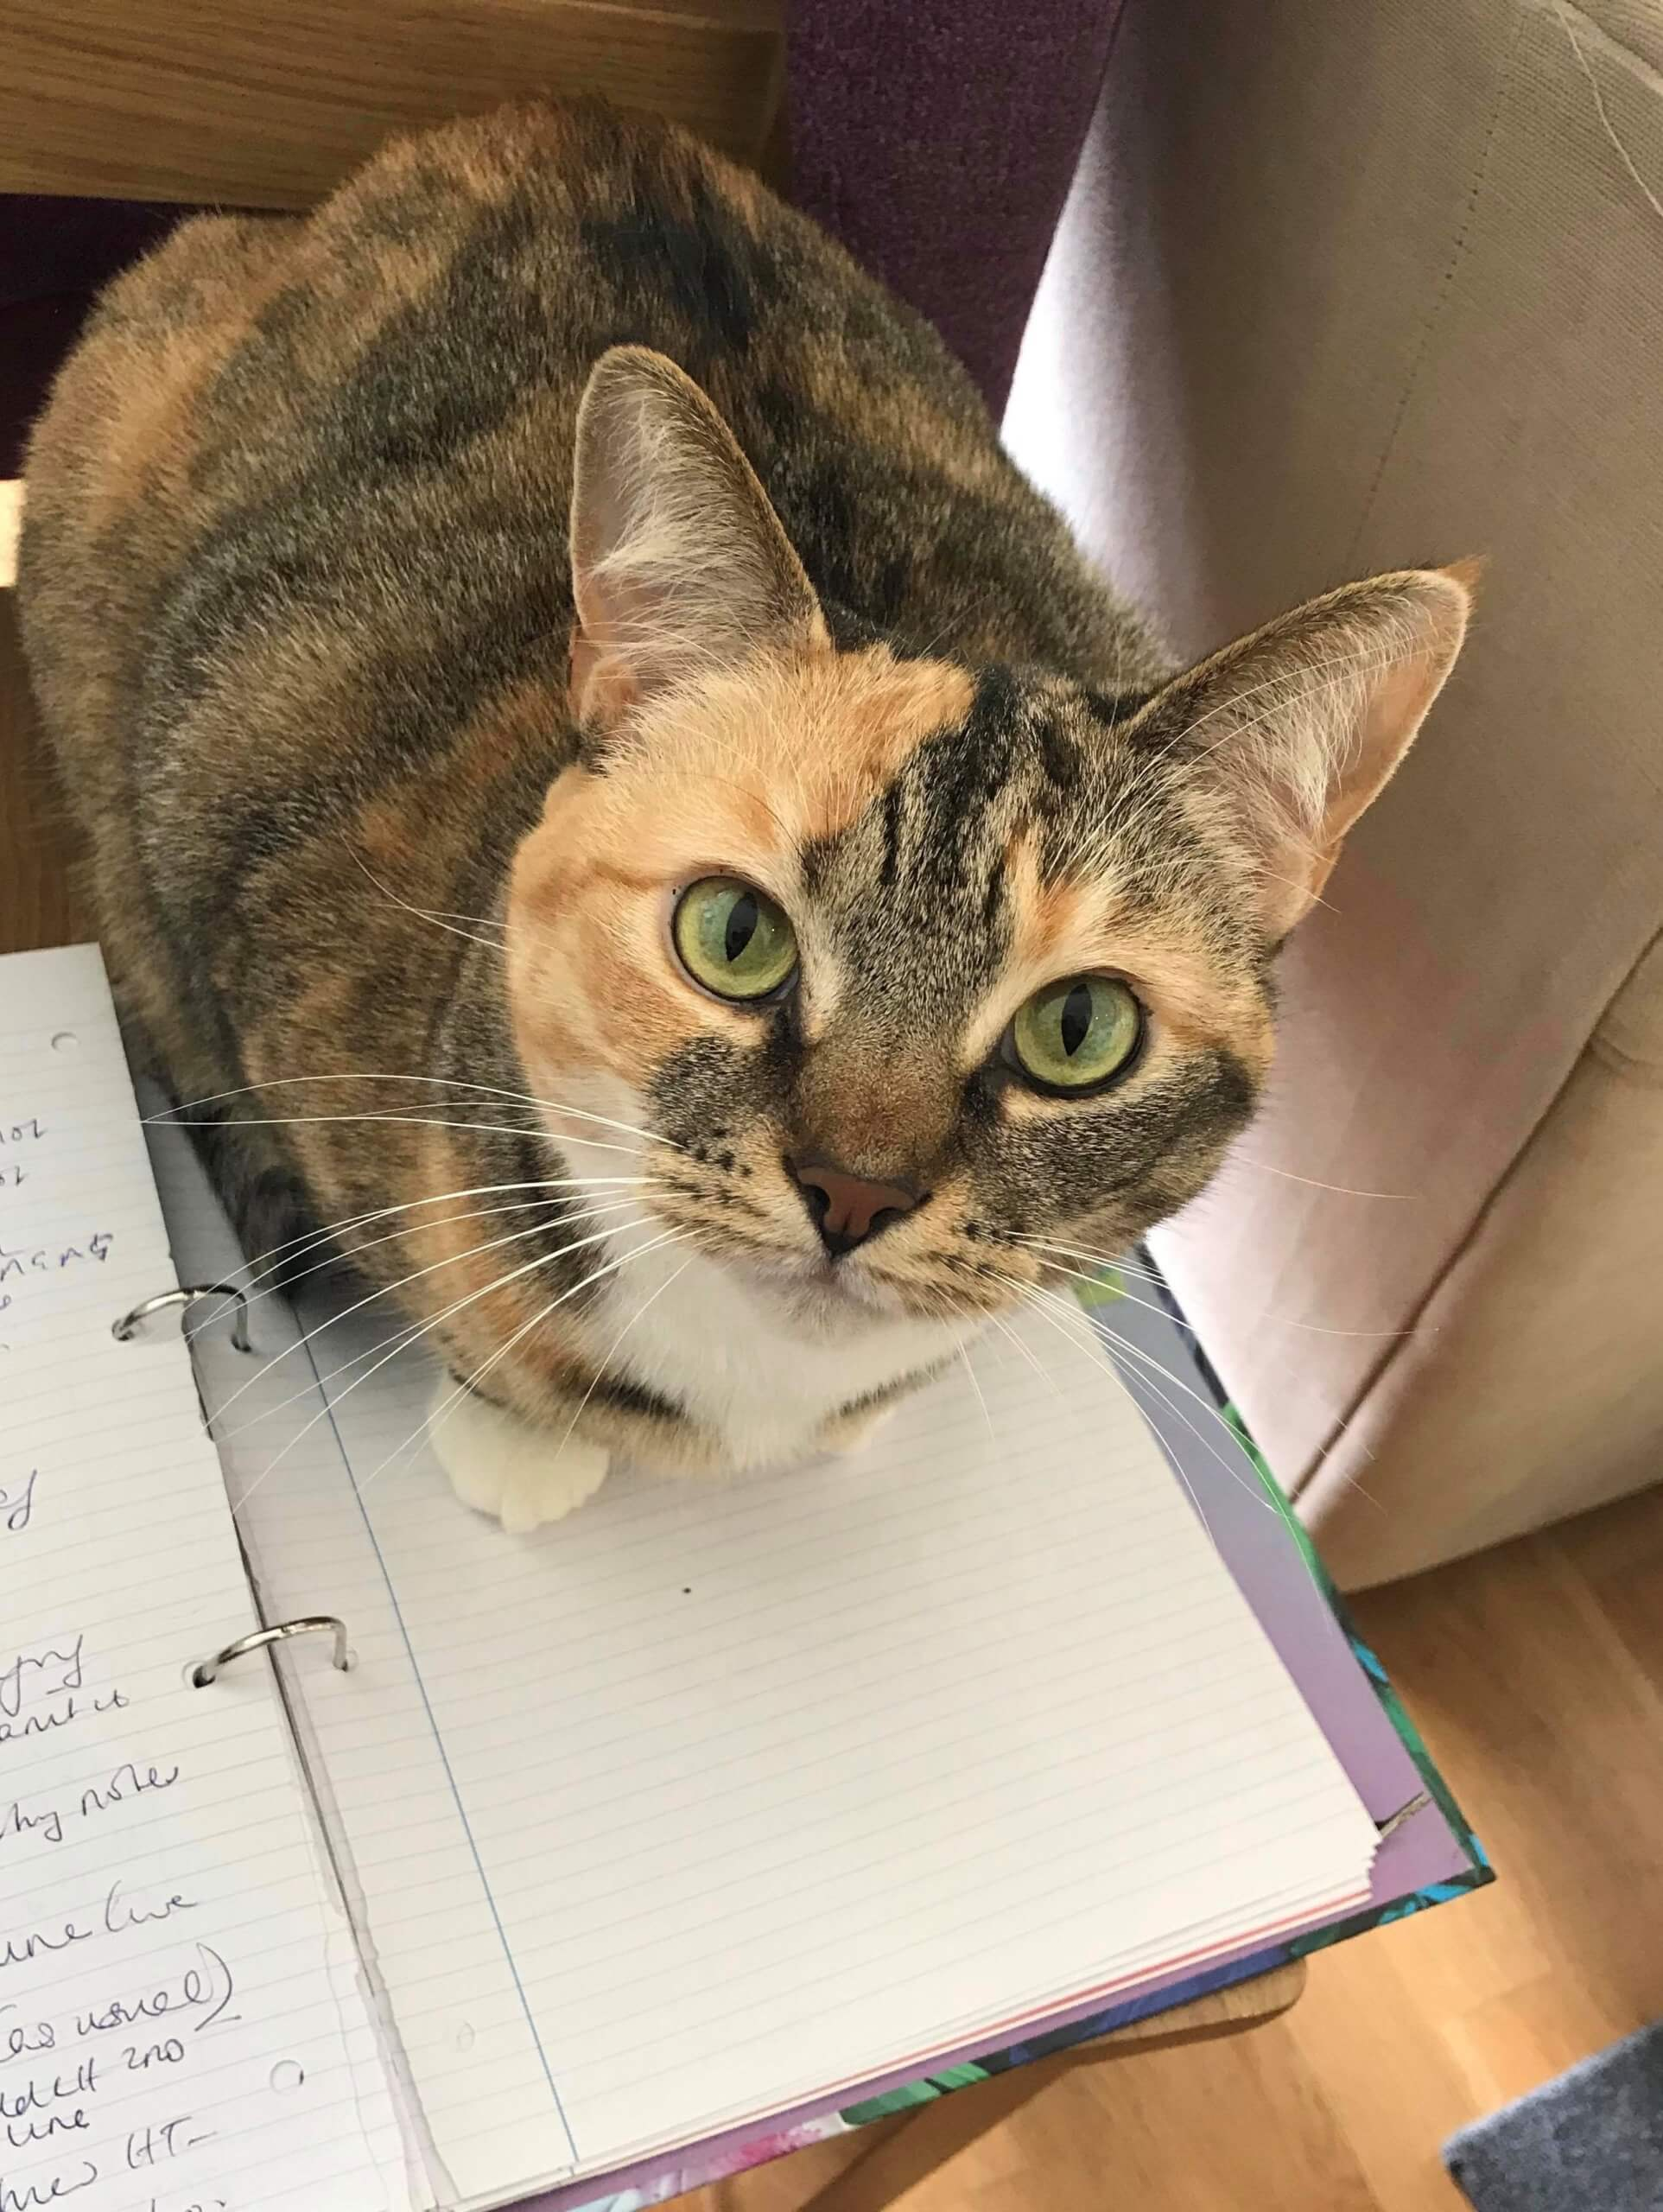 Sasha the cat - her owner is opera student Tim Edmundson